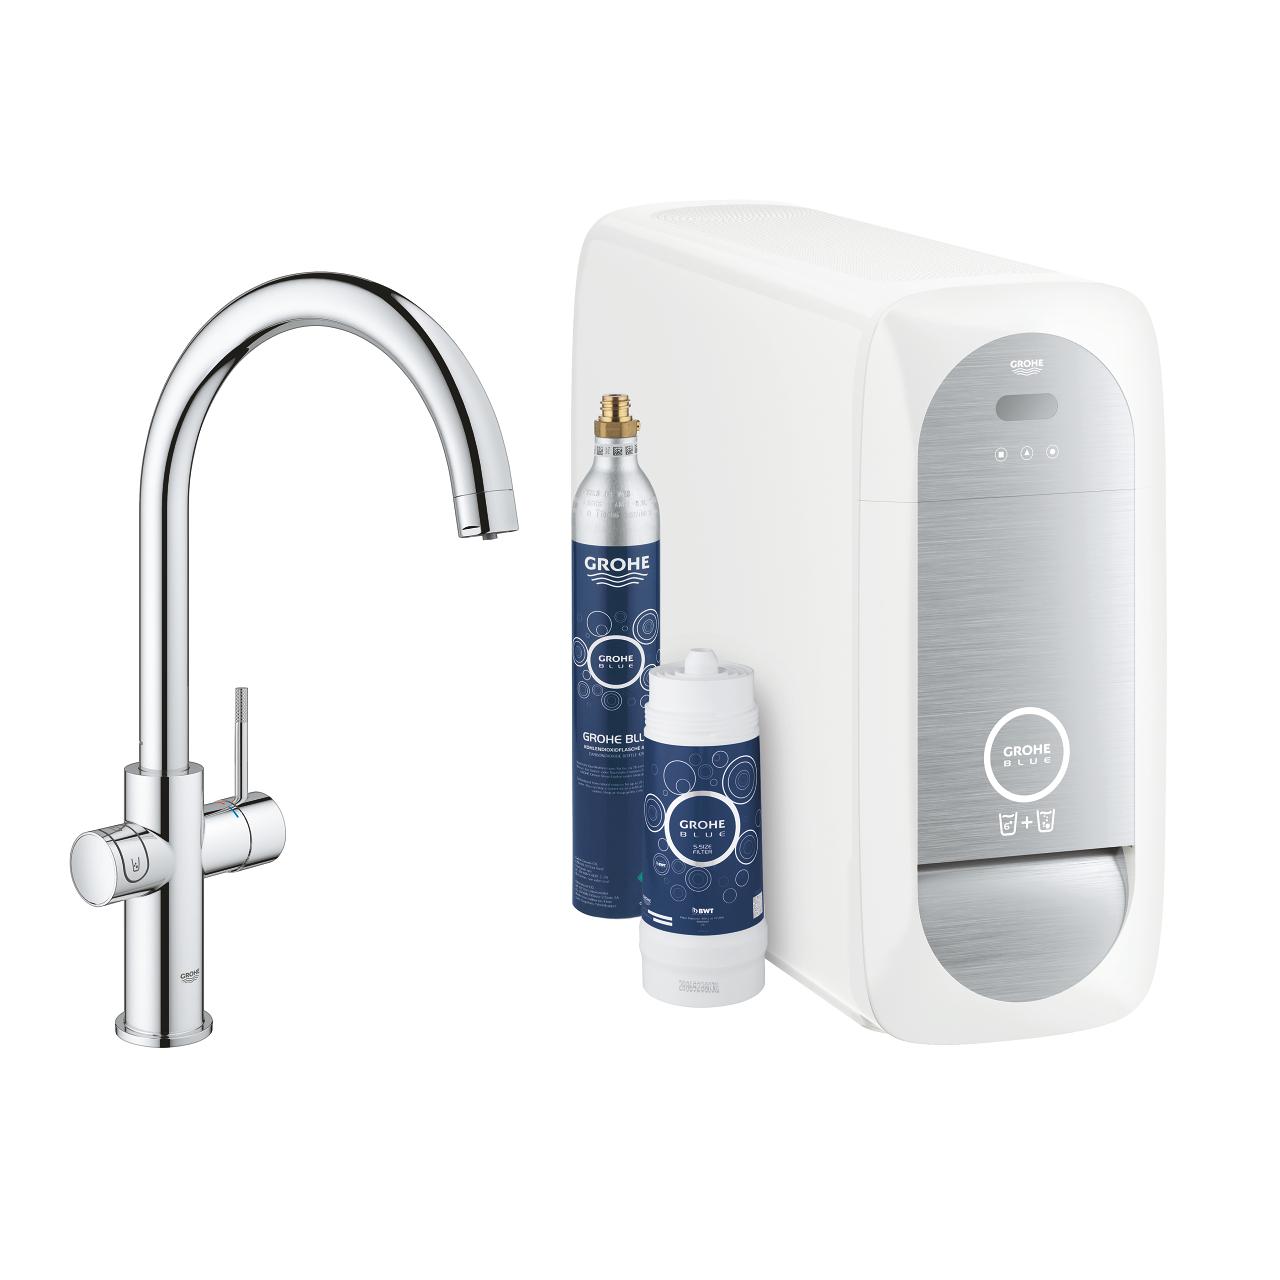 GROHE Blue Home Starter Kit L-Auslauf inkl. herausziehbarer Auslauf